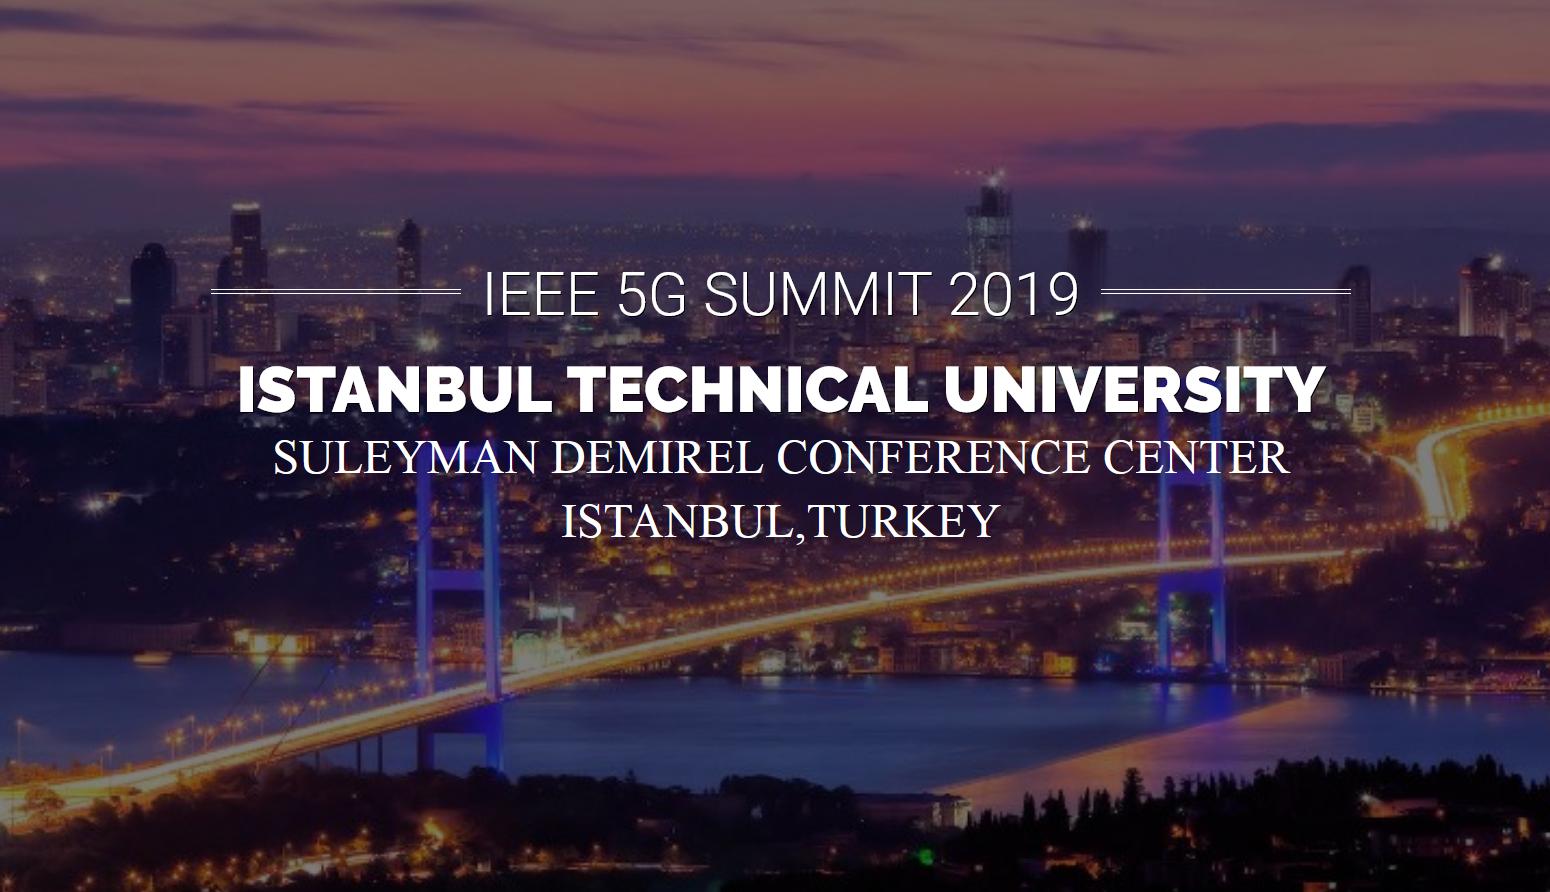 IEEE 5G SUMMIT İstanbul Zirvesi Sonuçlandı!